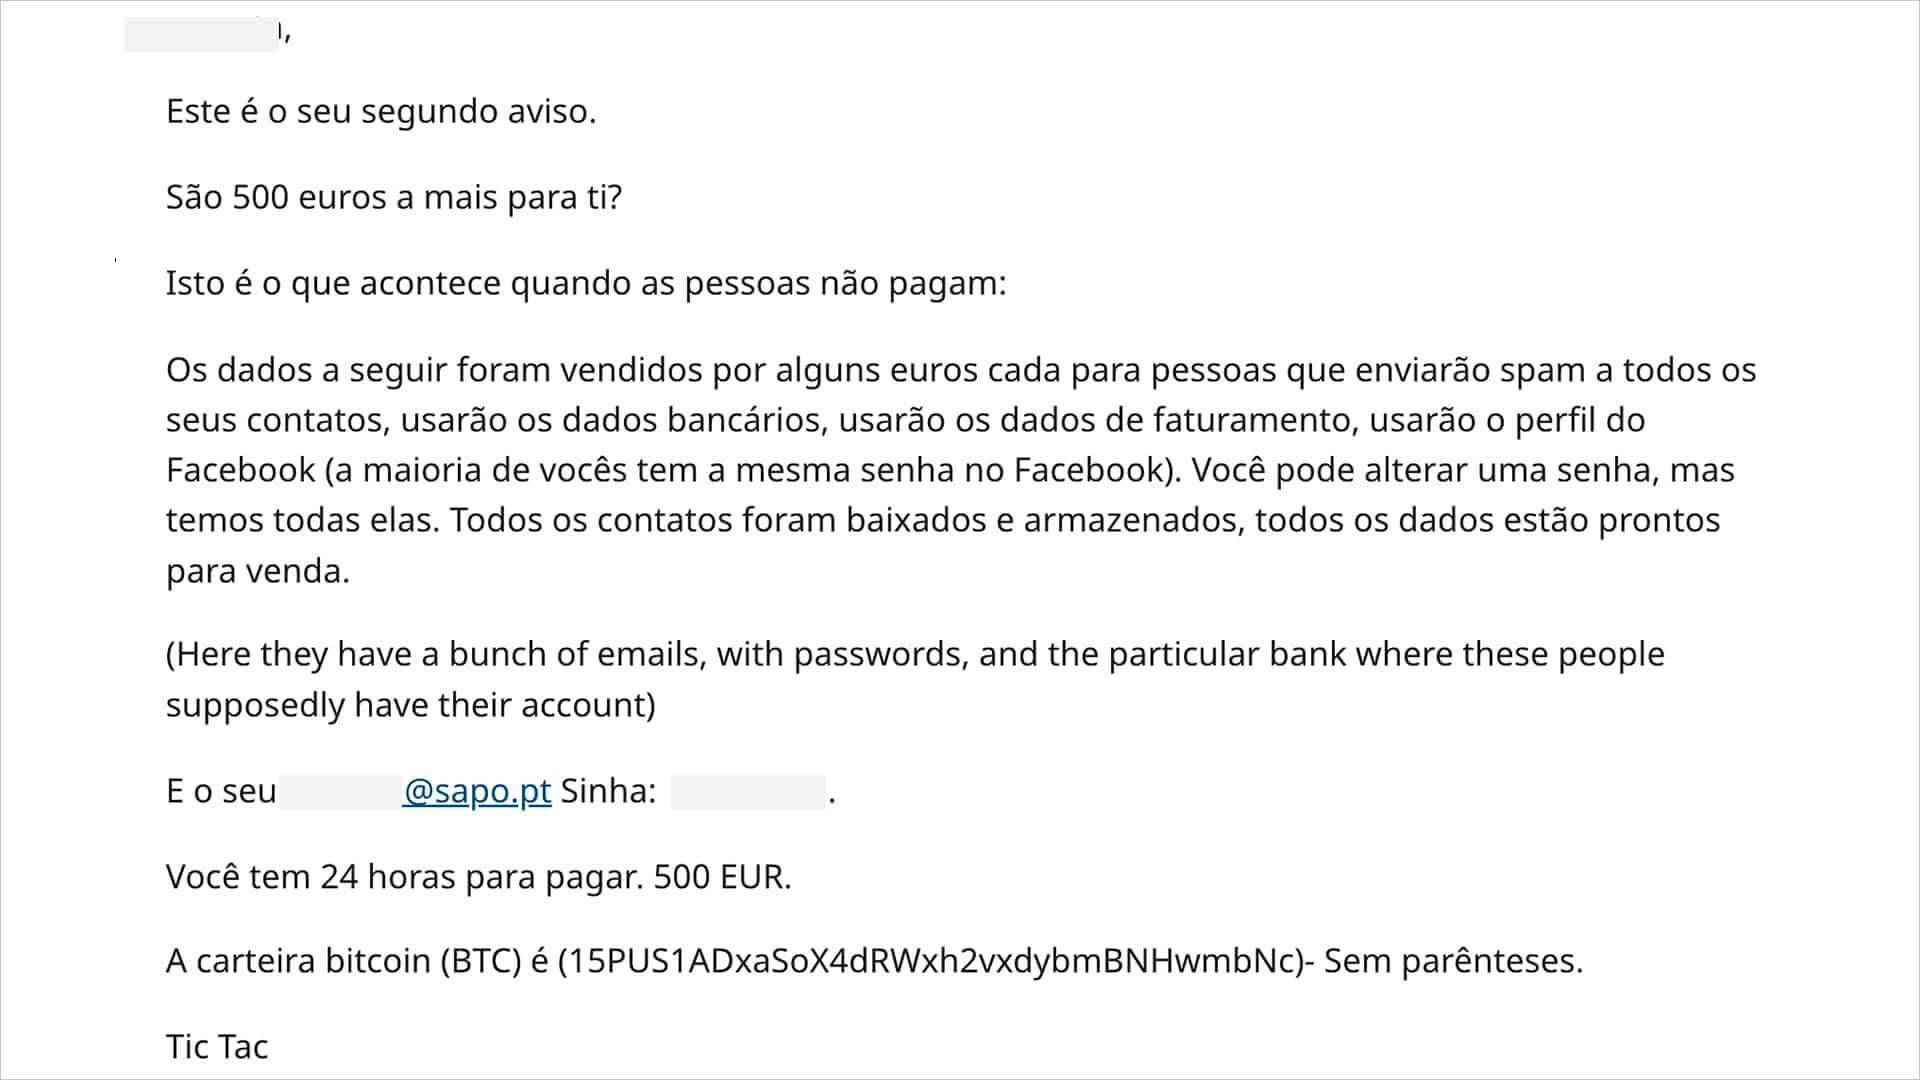 mensagem_extorsão_mail_spam_netSegura